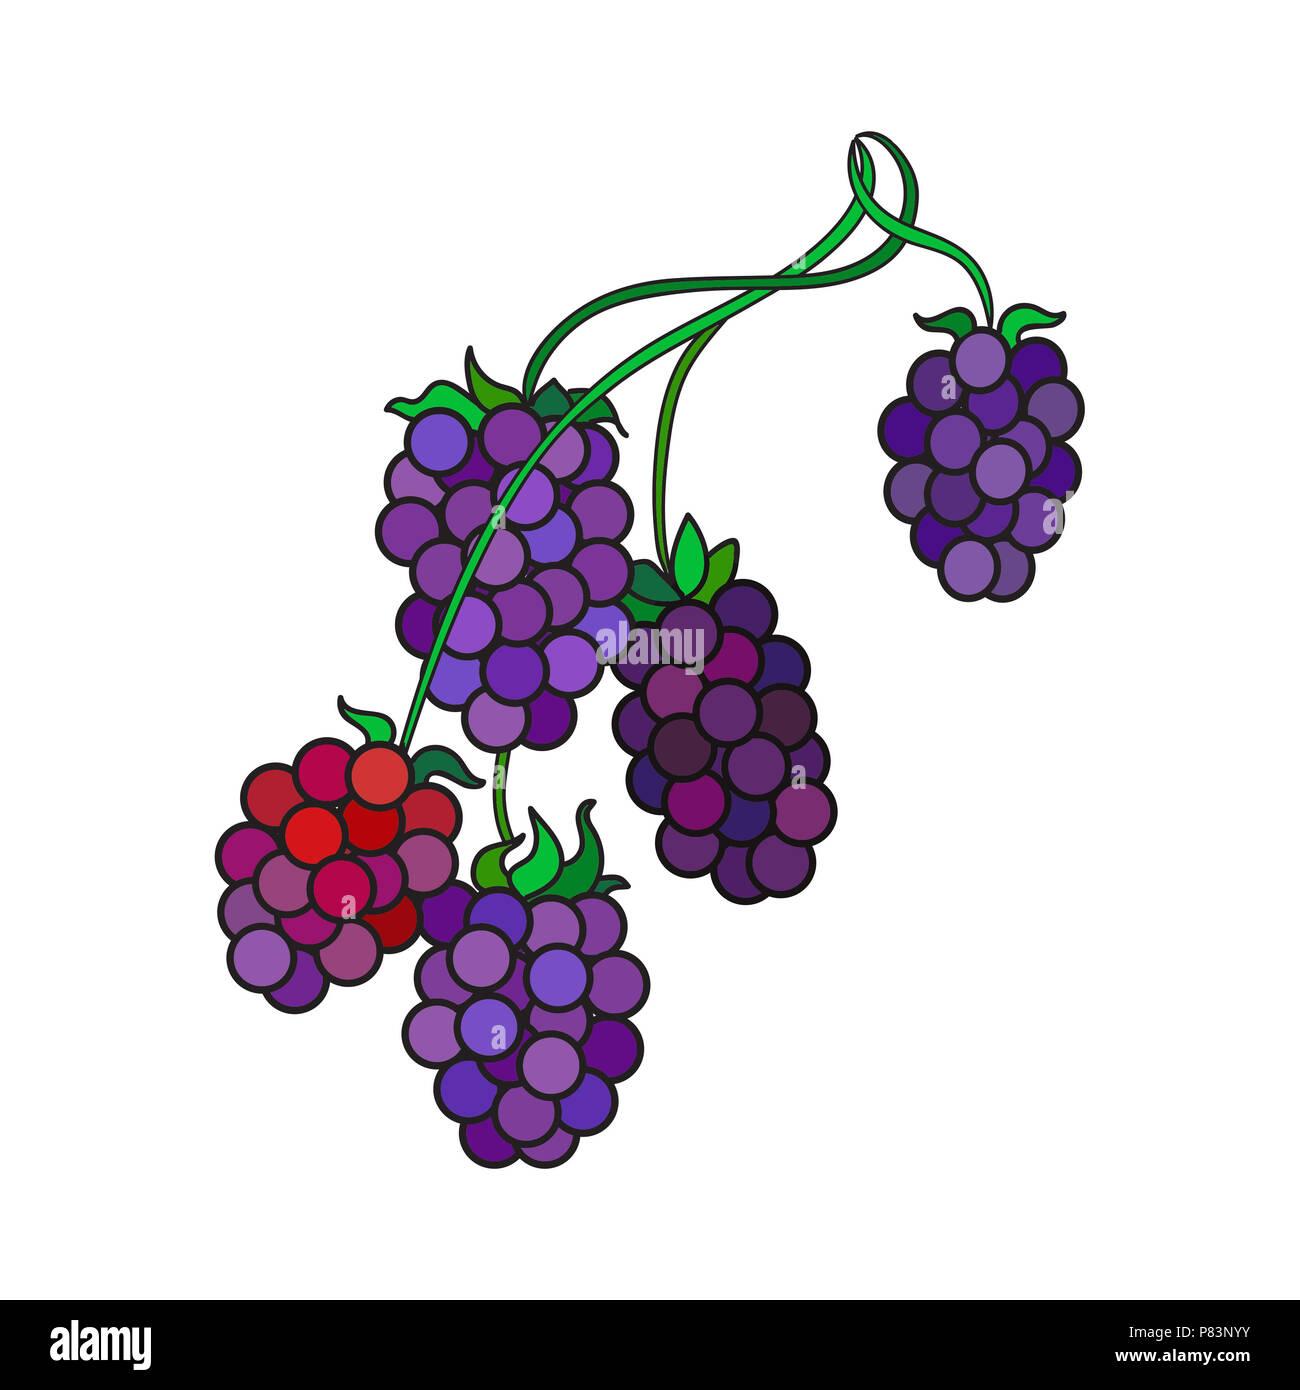 Illustration of raspberries on the stem against a white background. - Stock Image